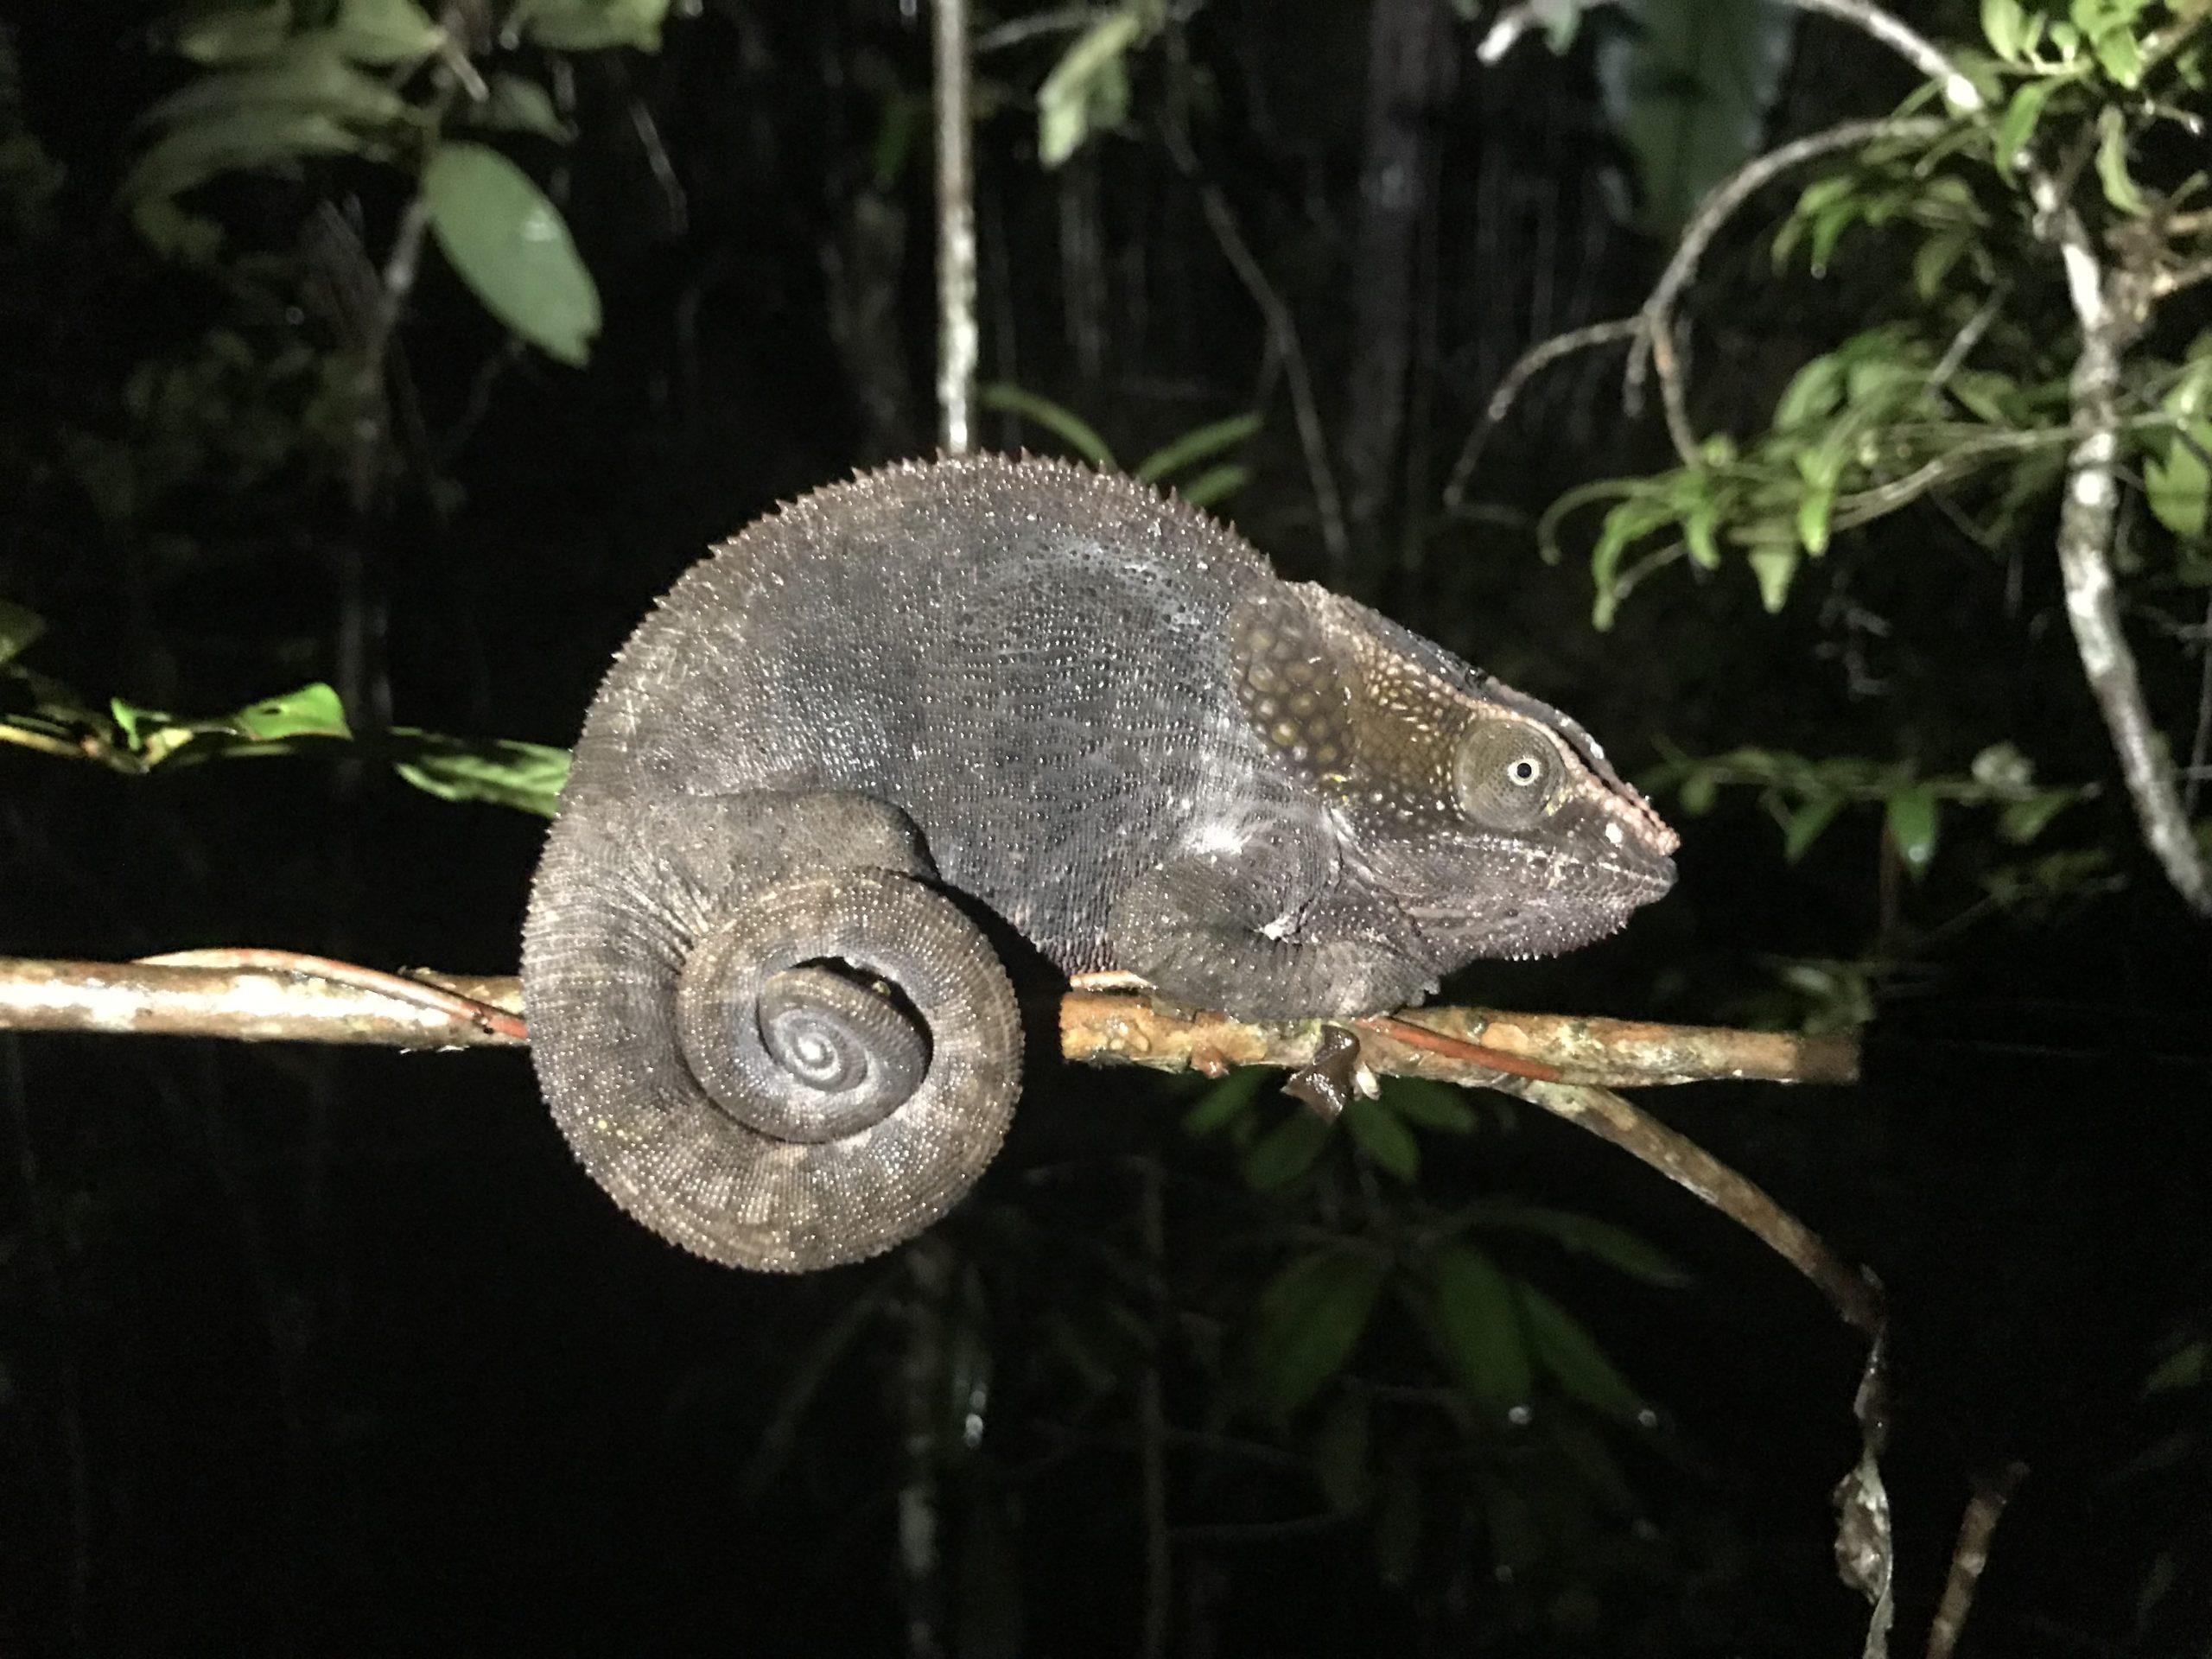 Chameleon in tree during night walk at Andasibe